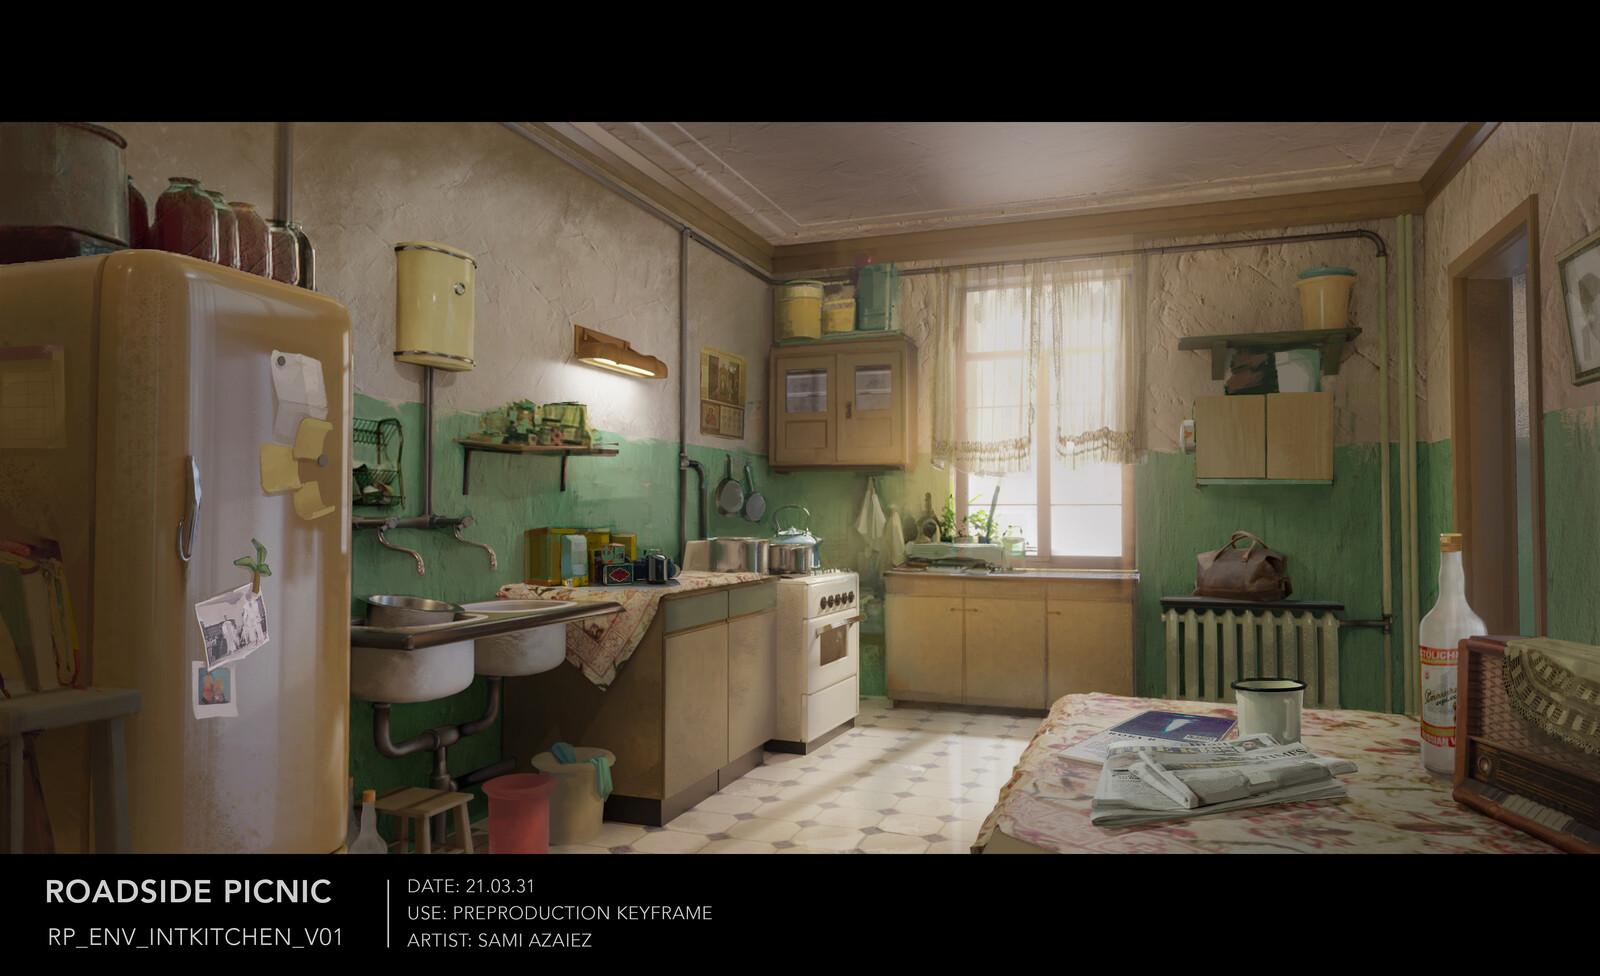 Redrick's Kitchen